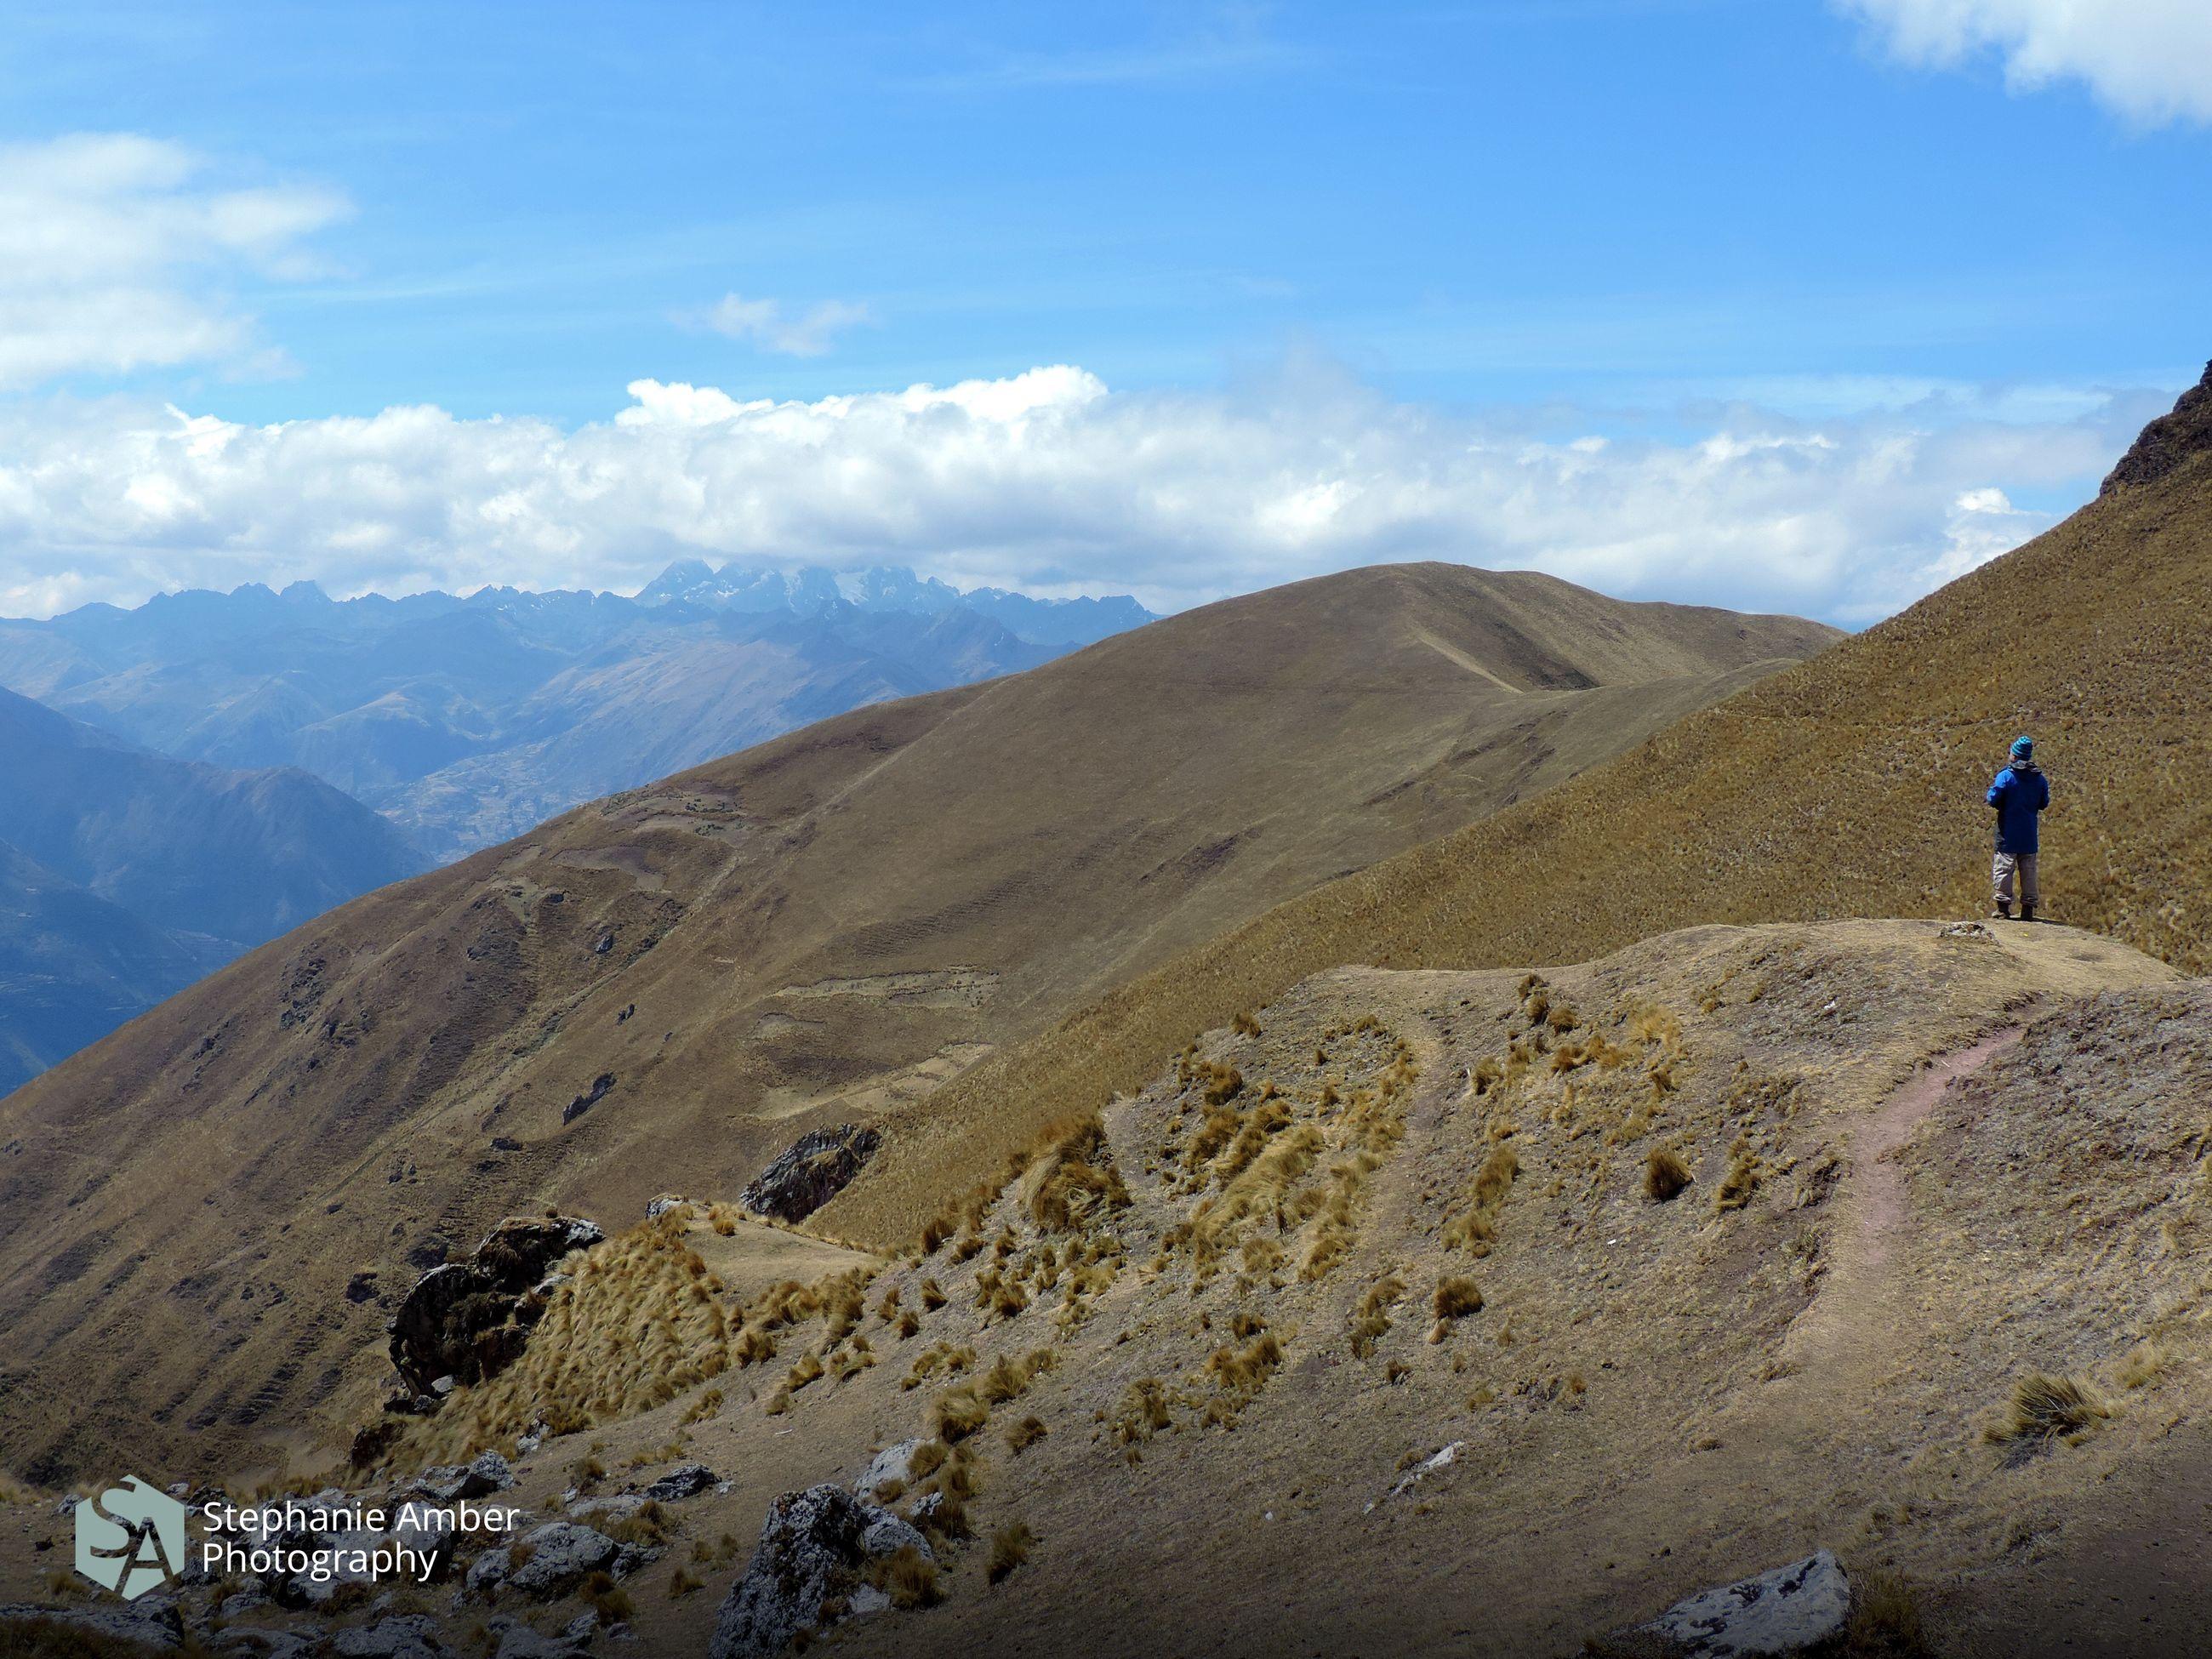 mountain, leisure activity, scenics - nature, sky, beauty in nature, real people, mountain range, tranquil scene, lifestyles, hiking, non-urban scene, tranquility, cloud - sky, activity, nature, adventure, day, landscape, environment, idyllic, outdoors, mountain peak